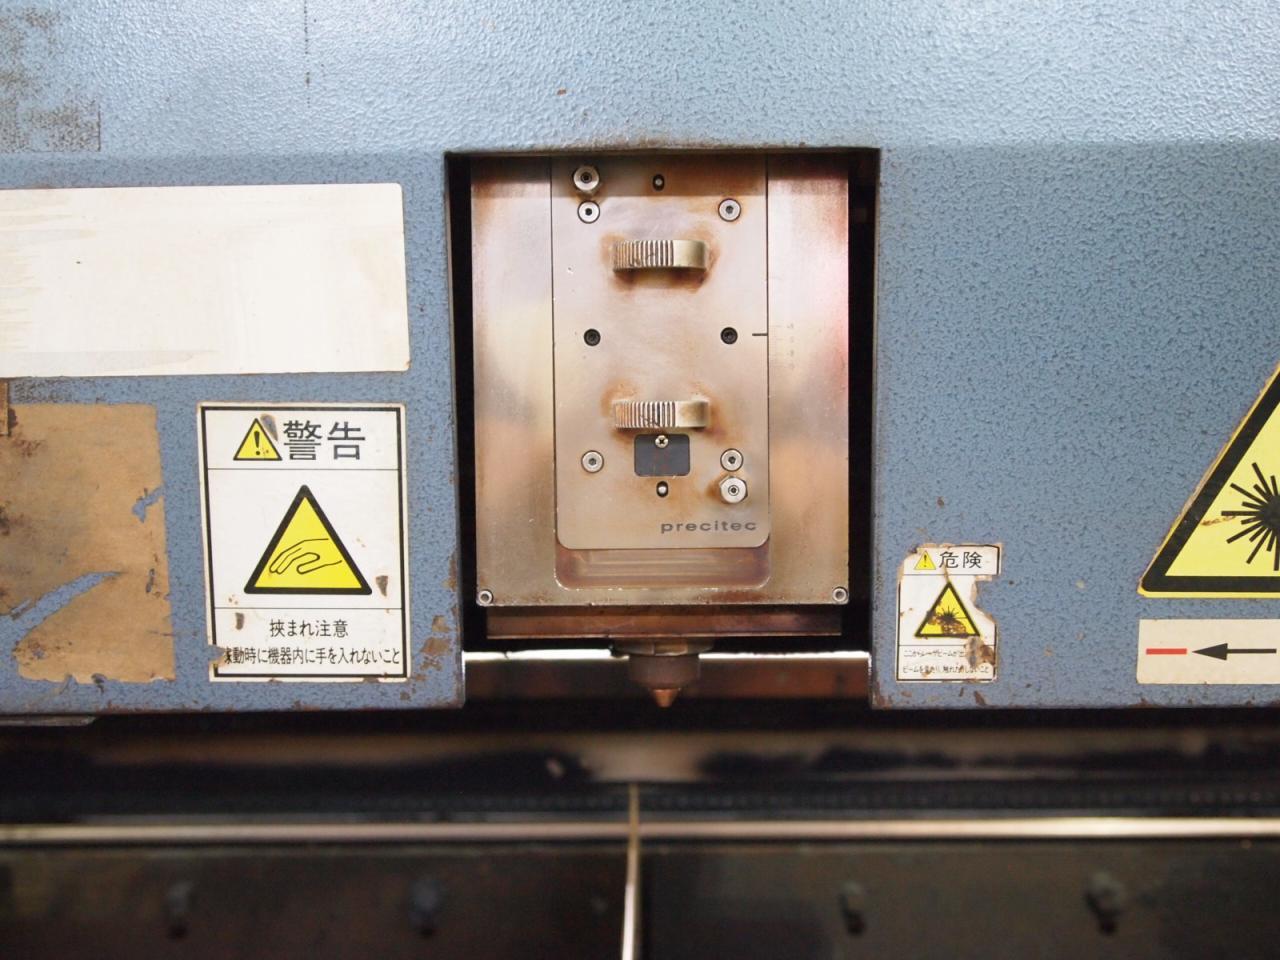 ML2512LVPのレーザーヘッド部